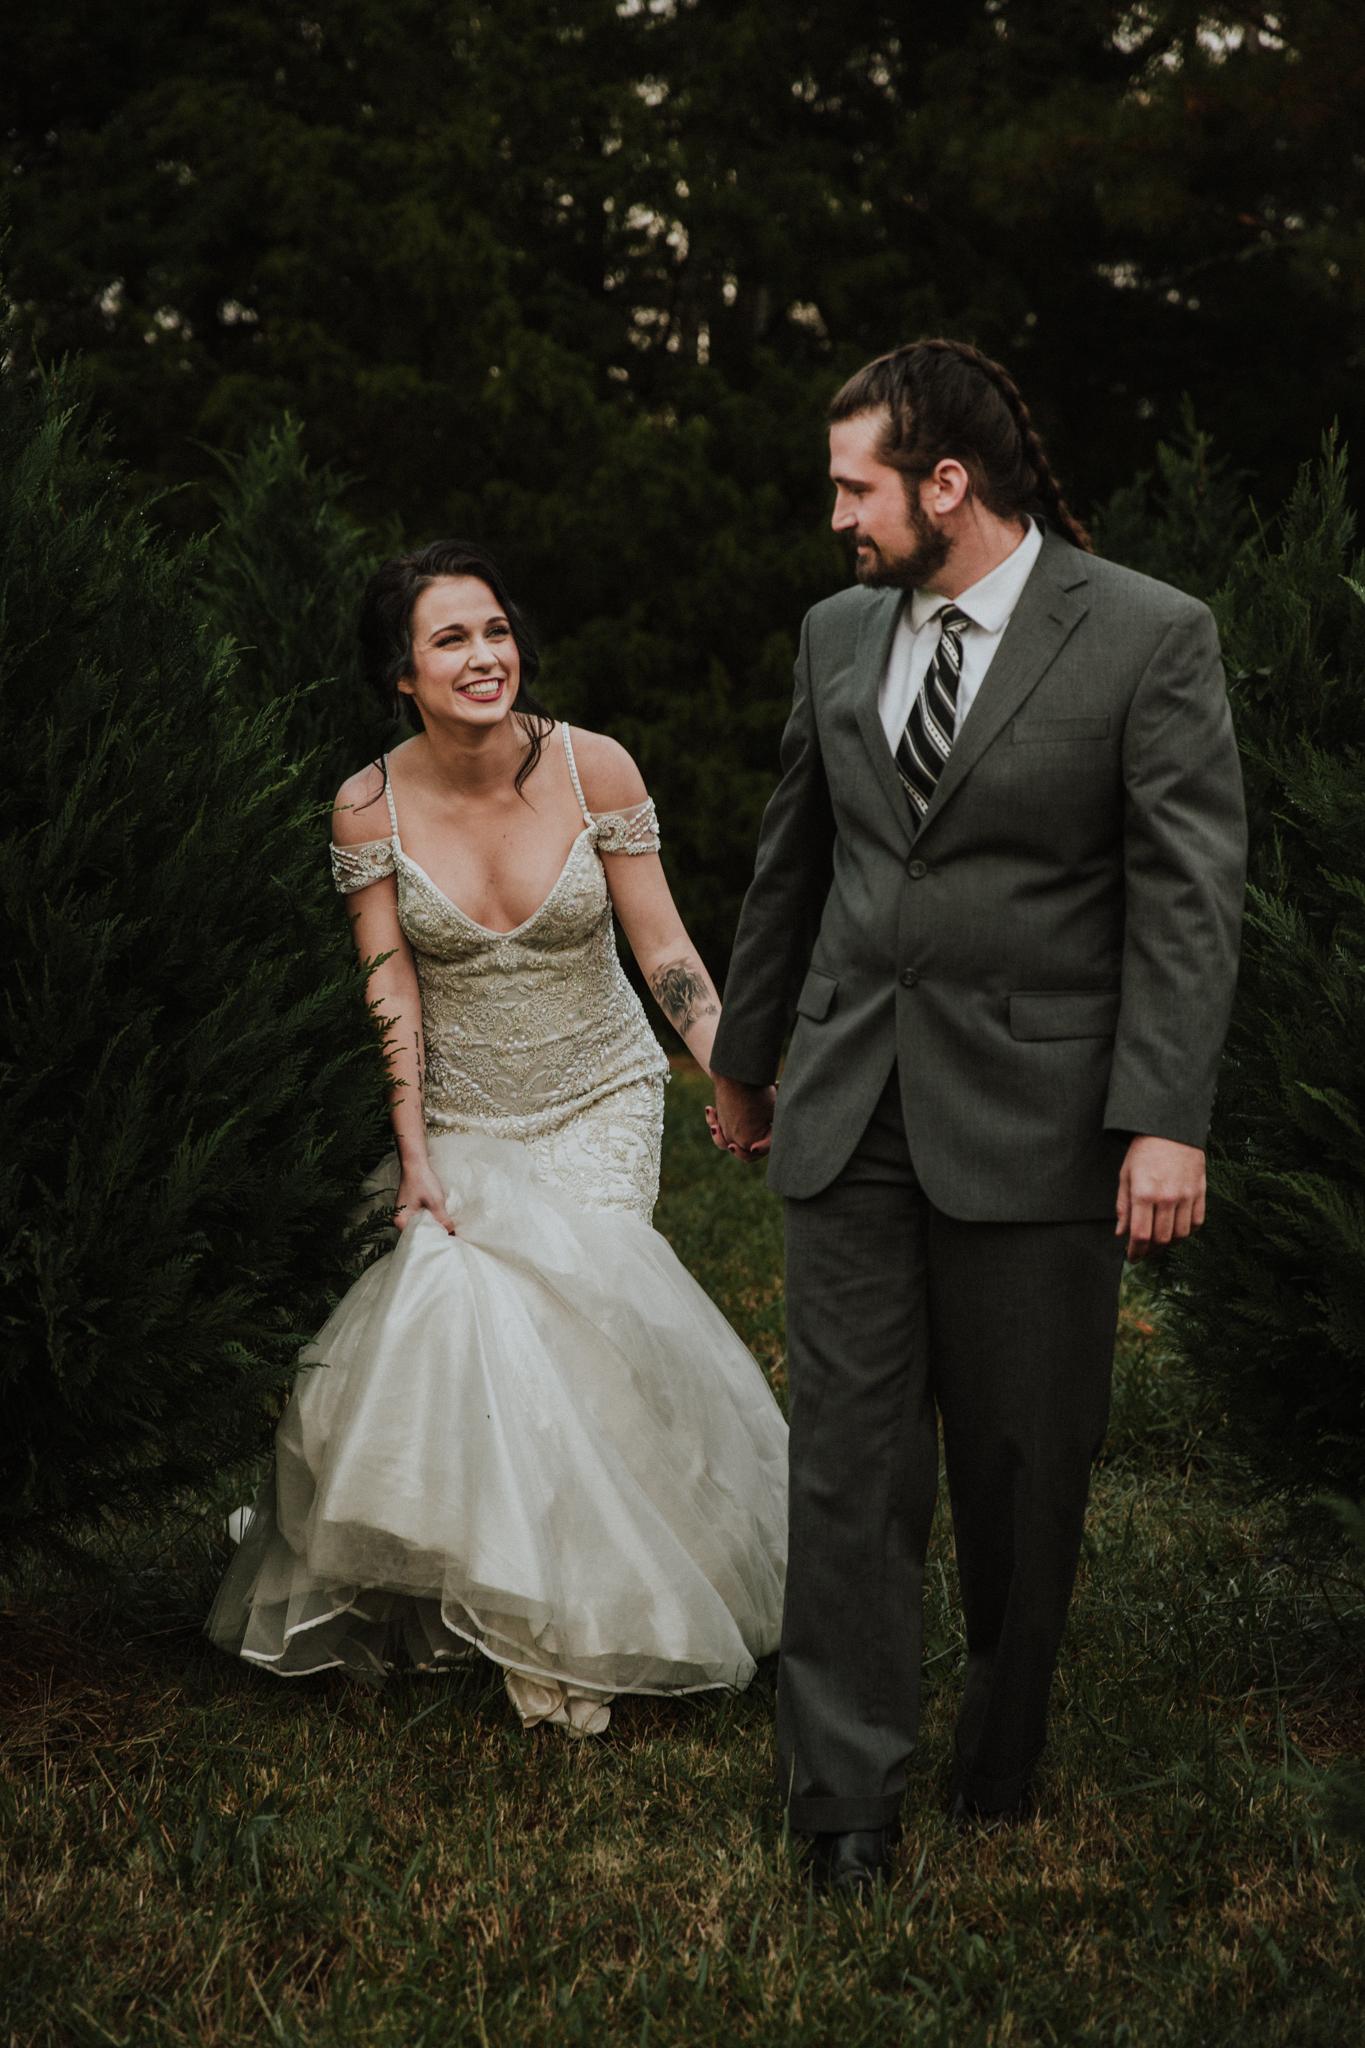 MonicaLeavellPhoto-North-Carolina-Intimate-Wedding-Photographer